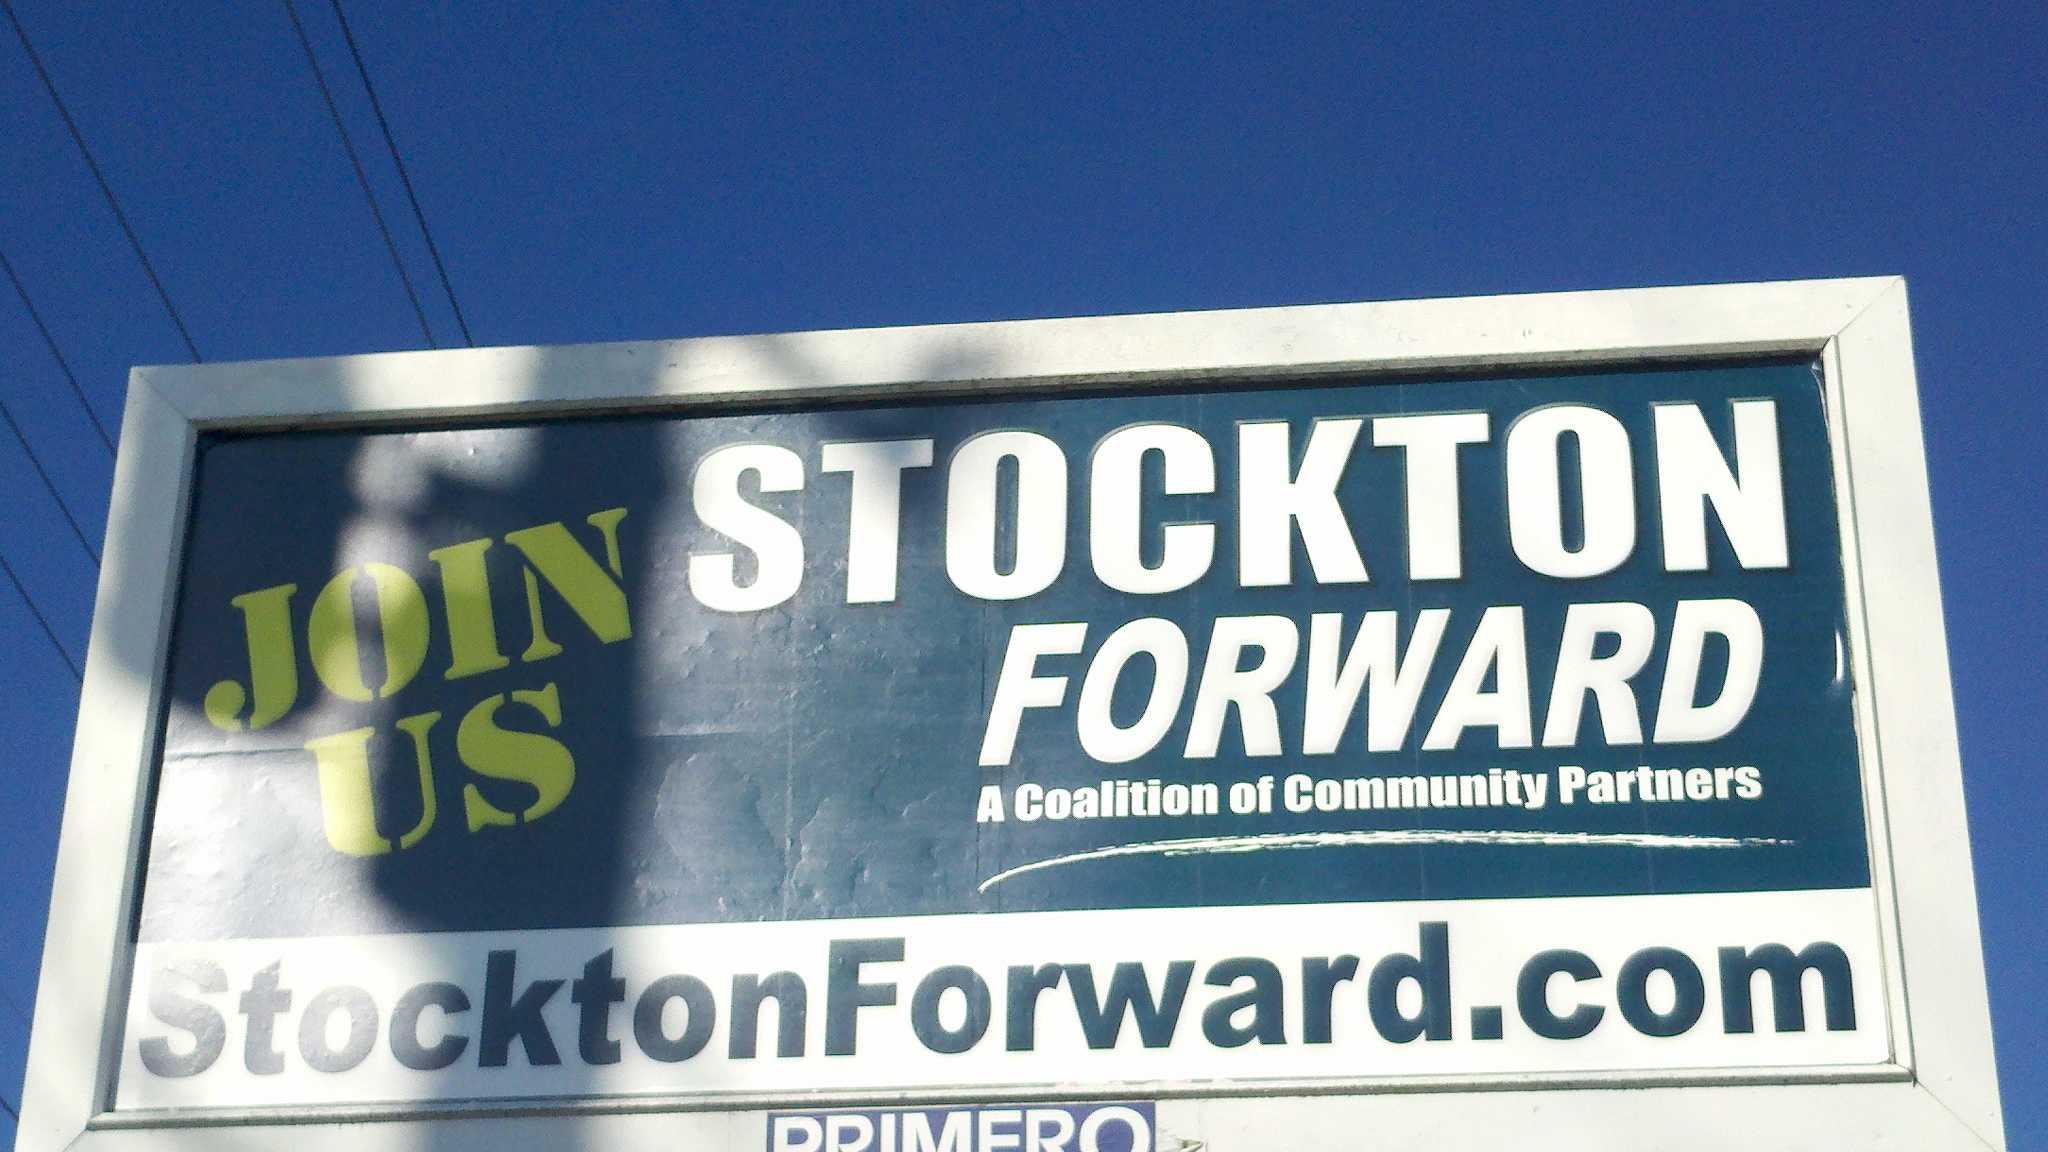 Stockton Forward